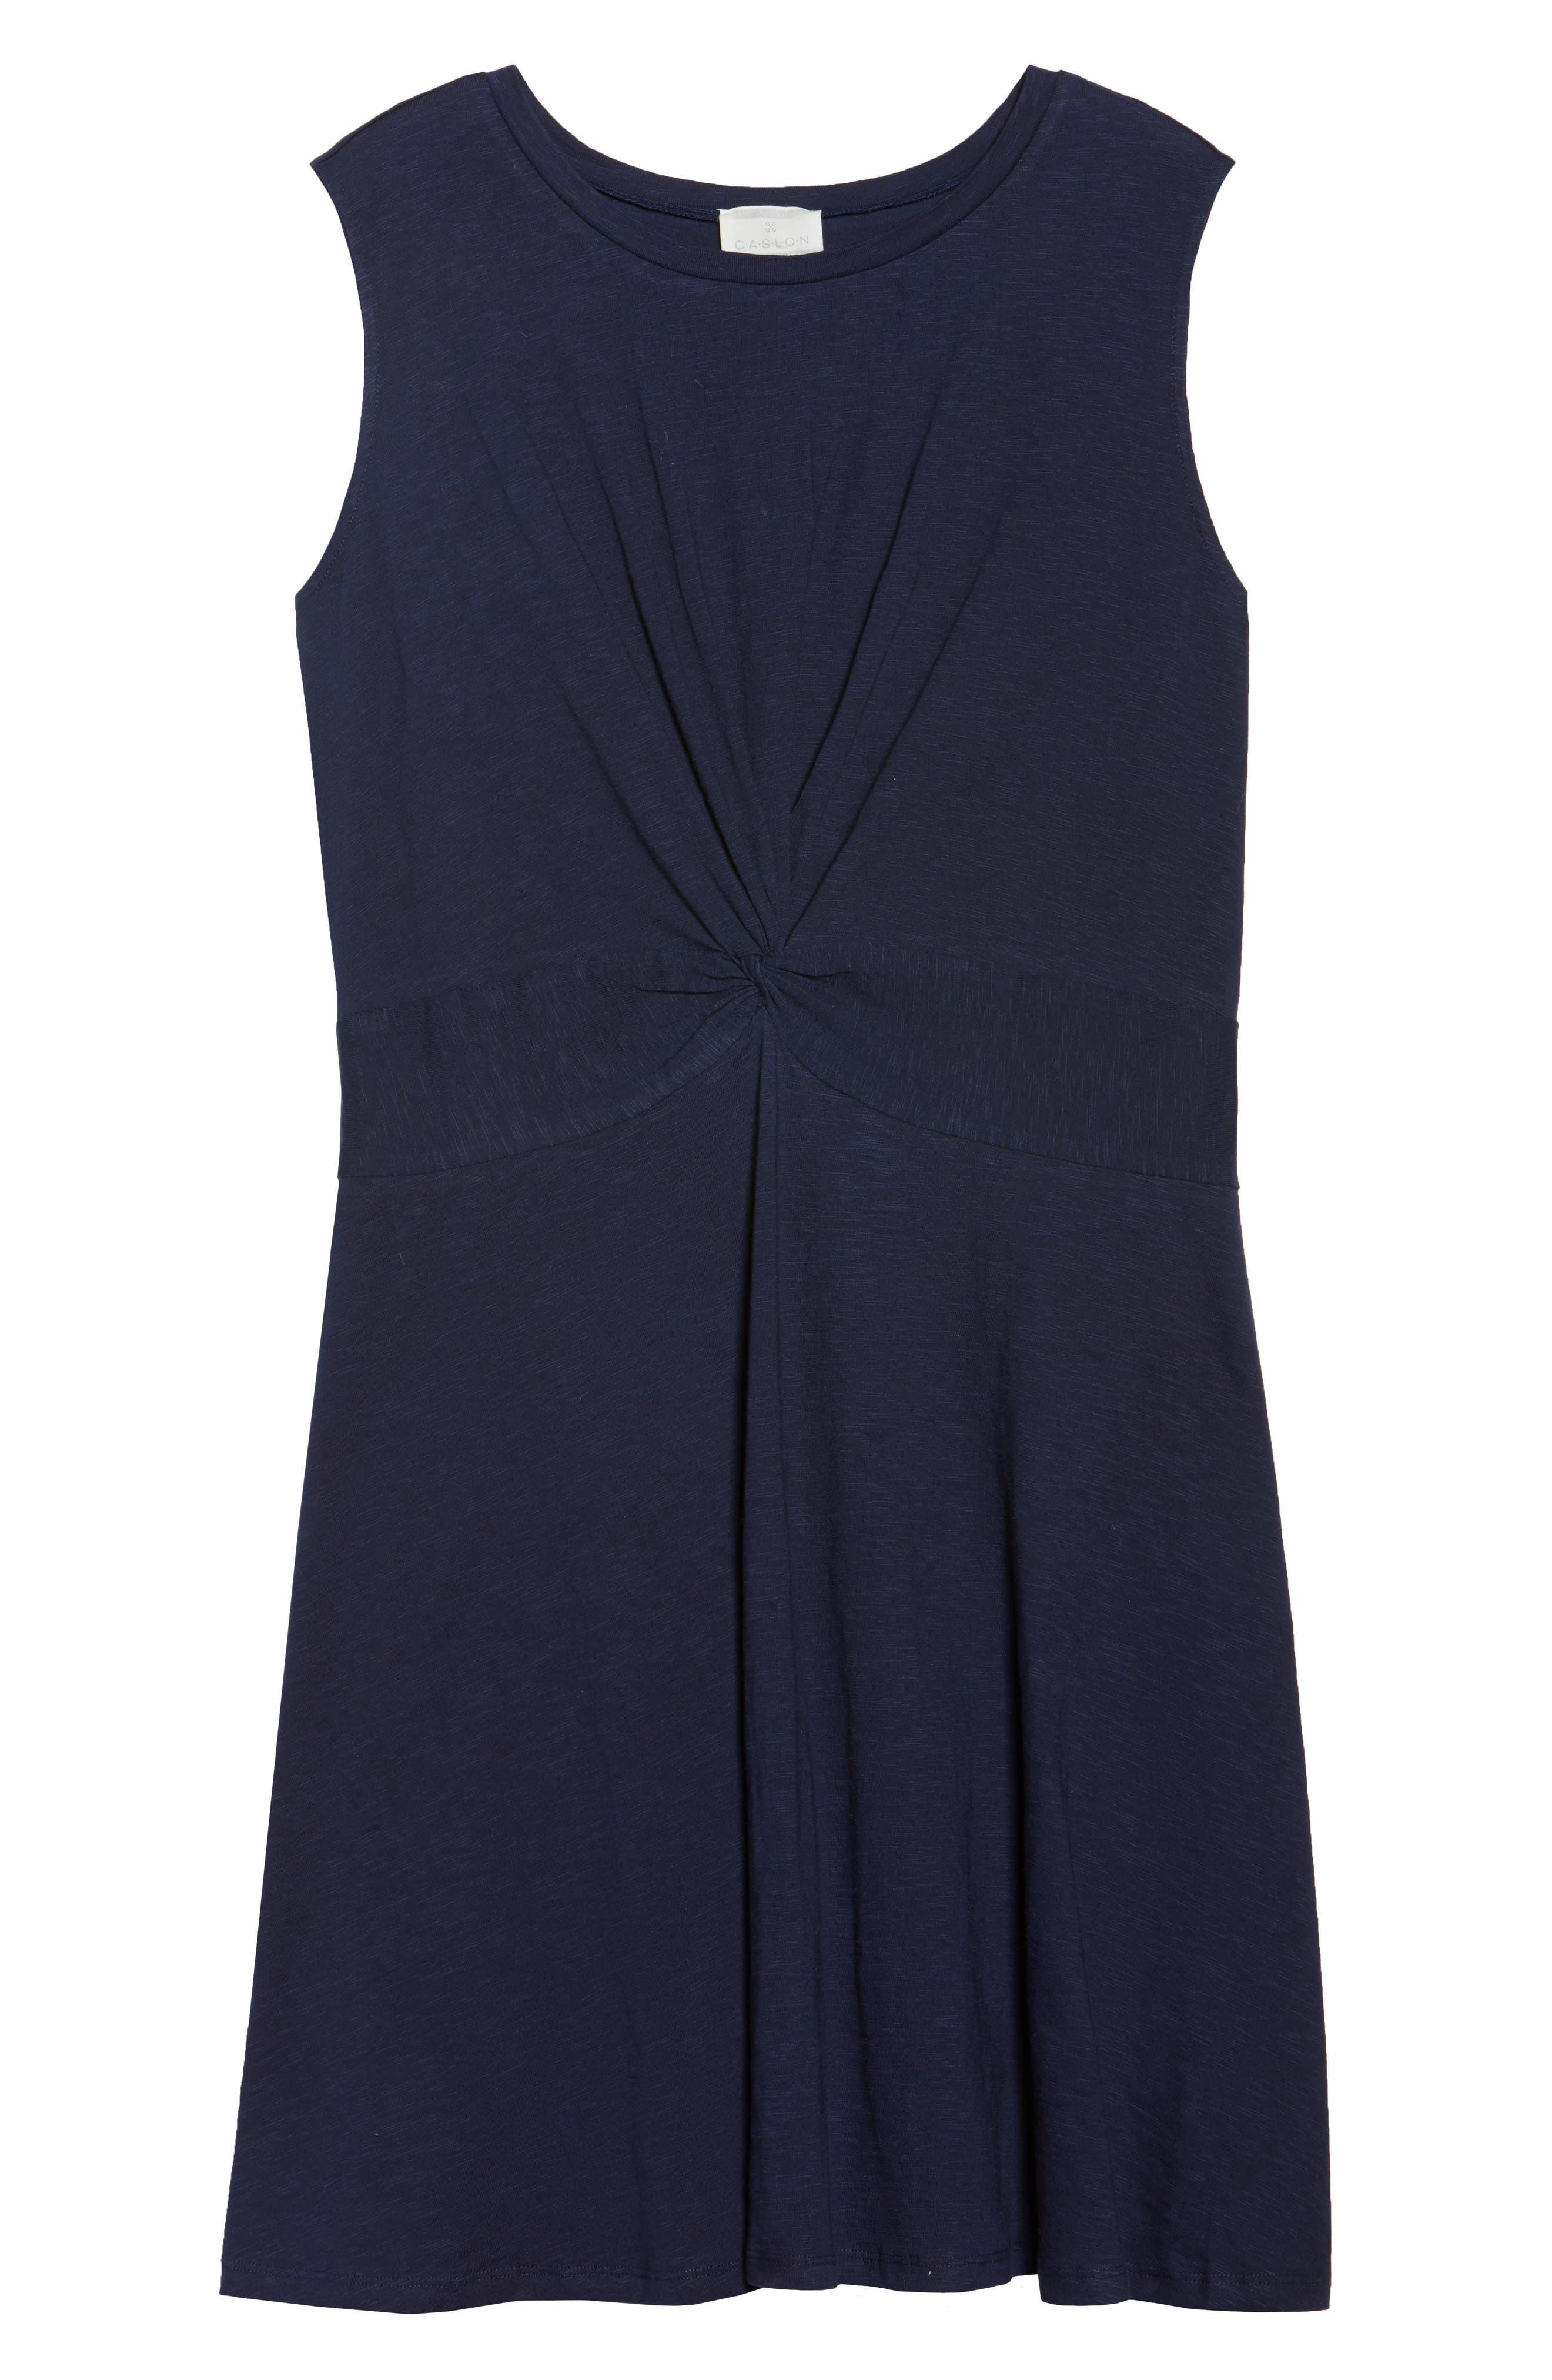 Twist Front Knit Dress,                             Alternate thumbnail 6, color,                             Navy Peacoat